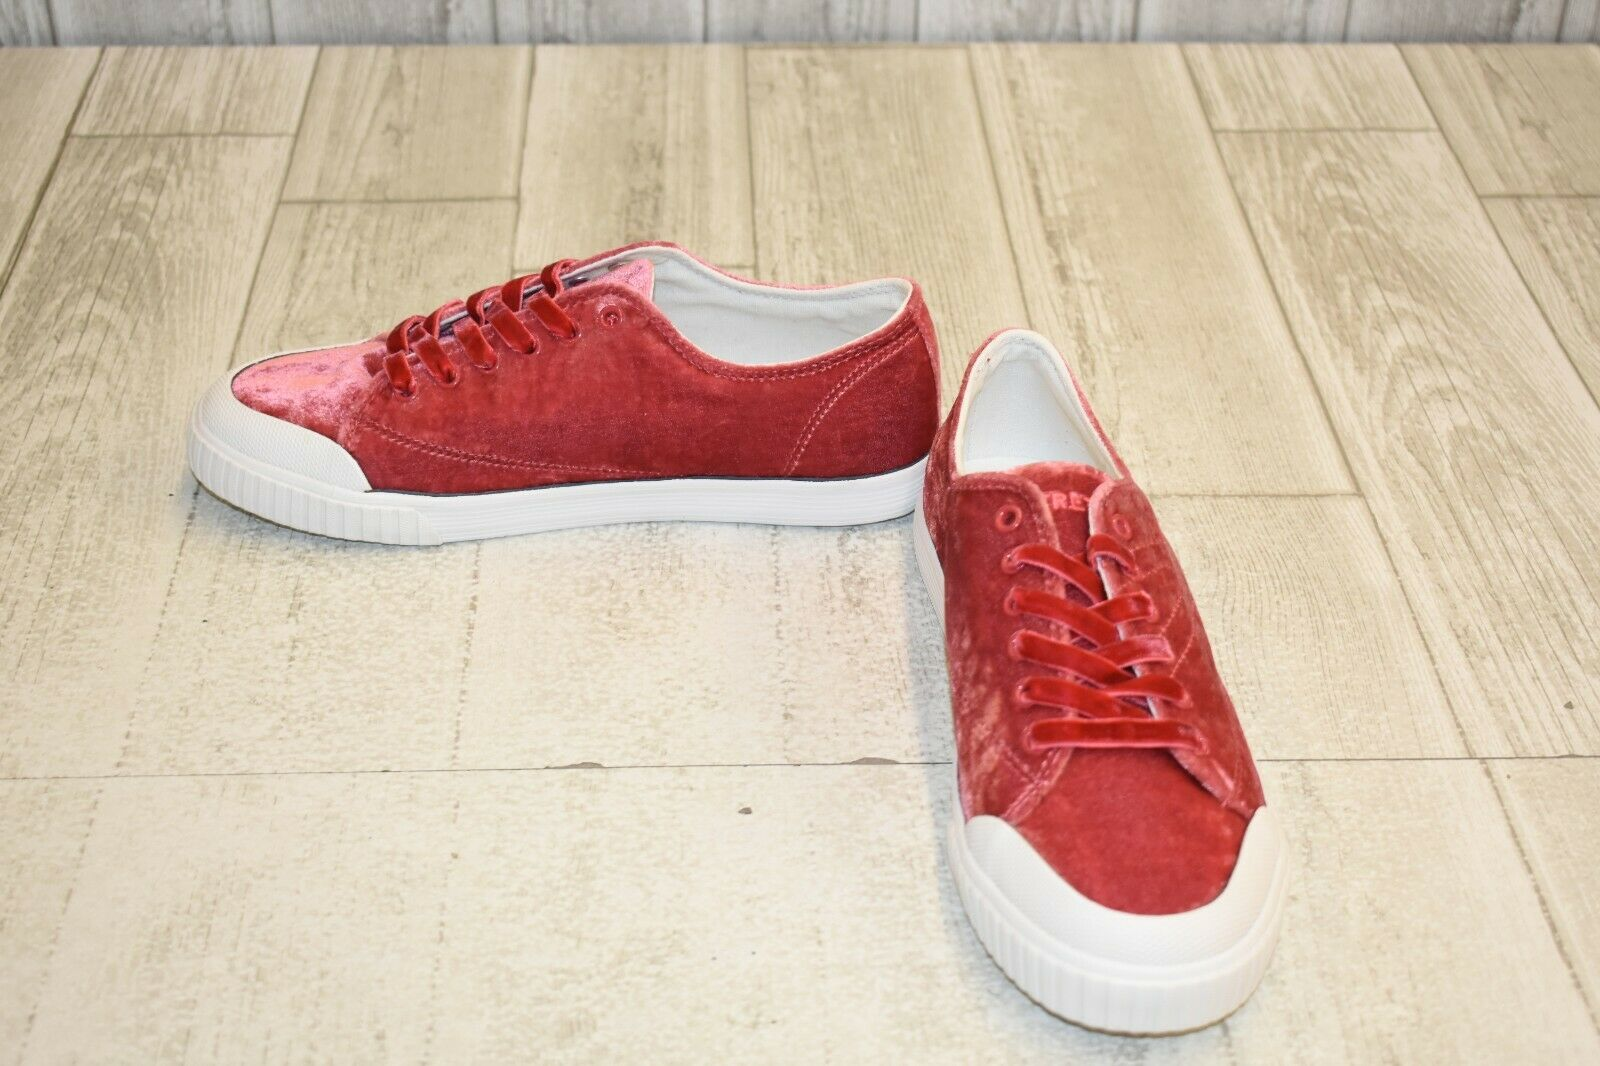 Tretorn Marley 4 Sneaker - Women's Size 7.5, Light Red